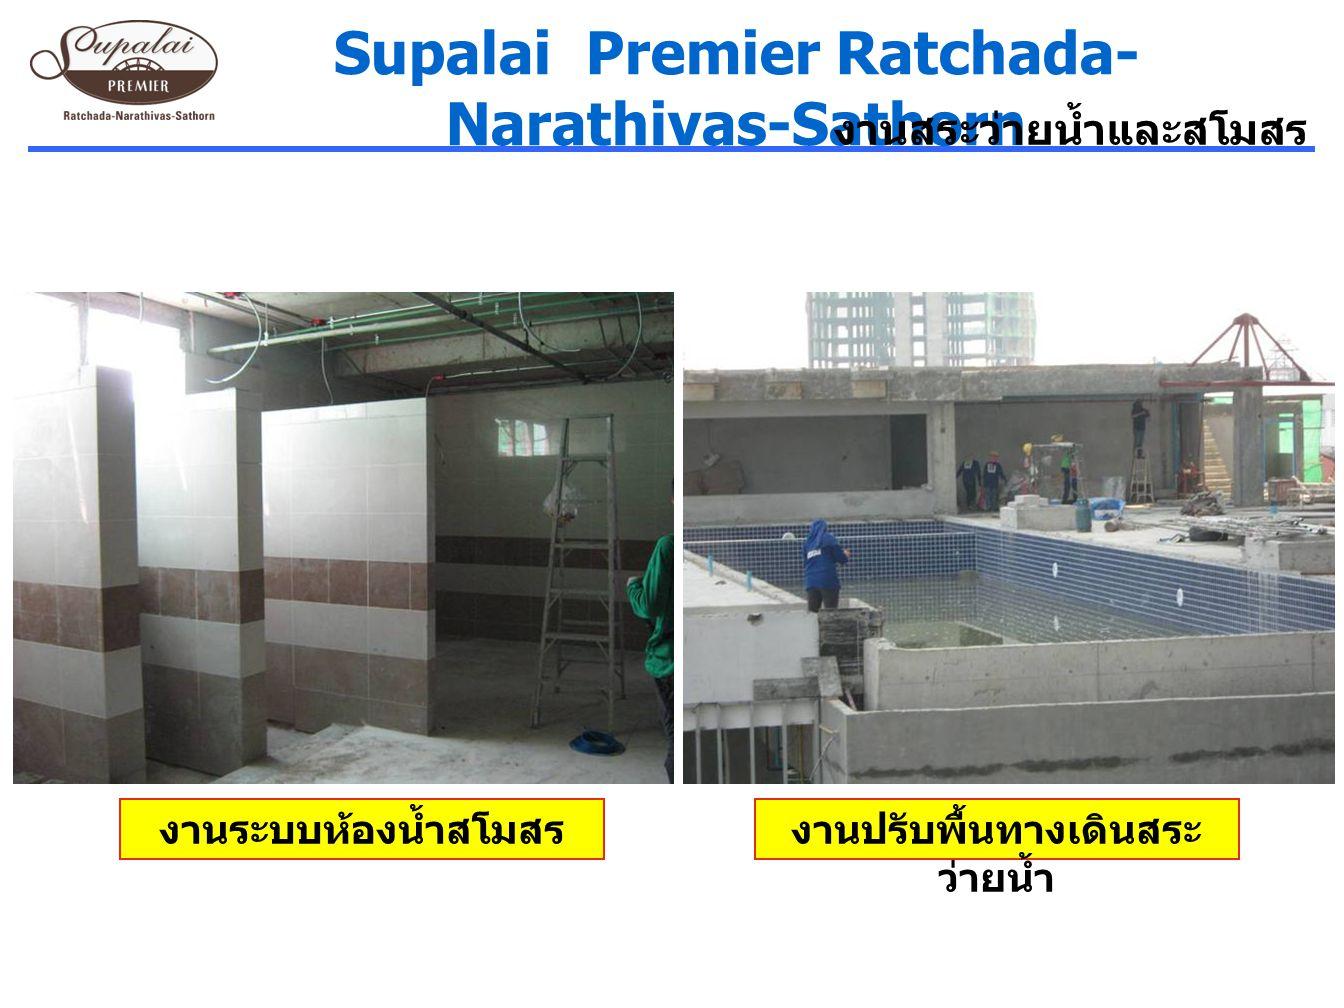 Supalai Premier Ratchada- Narathivas-Sathorn งานสระว่ายน้ำและสโมสร งานปรับพื้นทางเดินสระ ว่ายน้ำ งานระบบห้องน้ำสโมสร